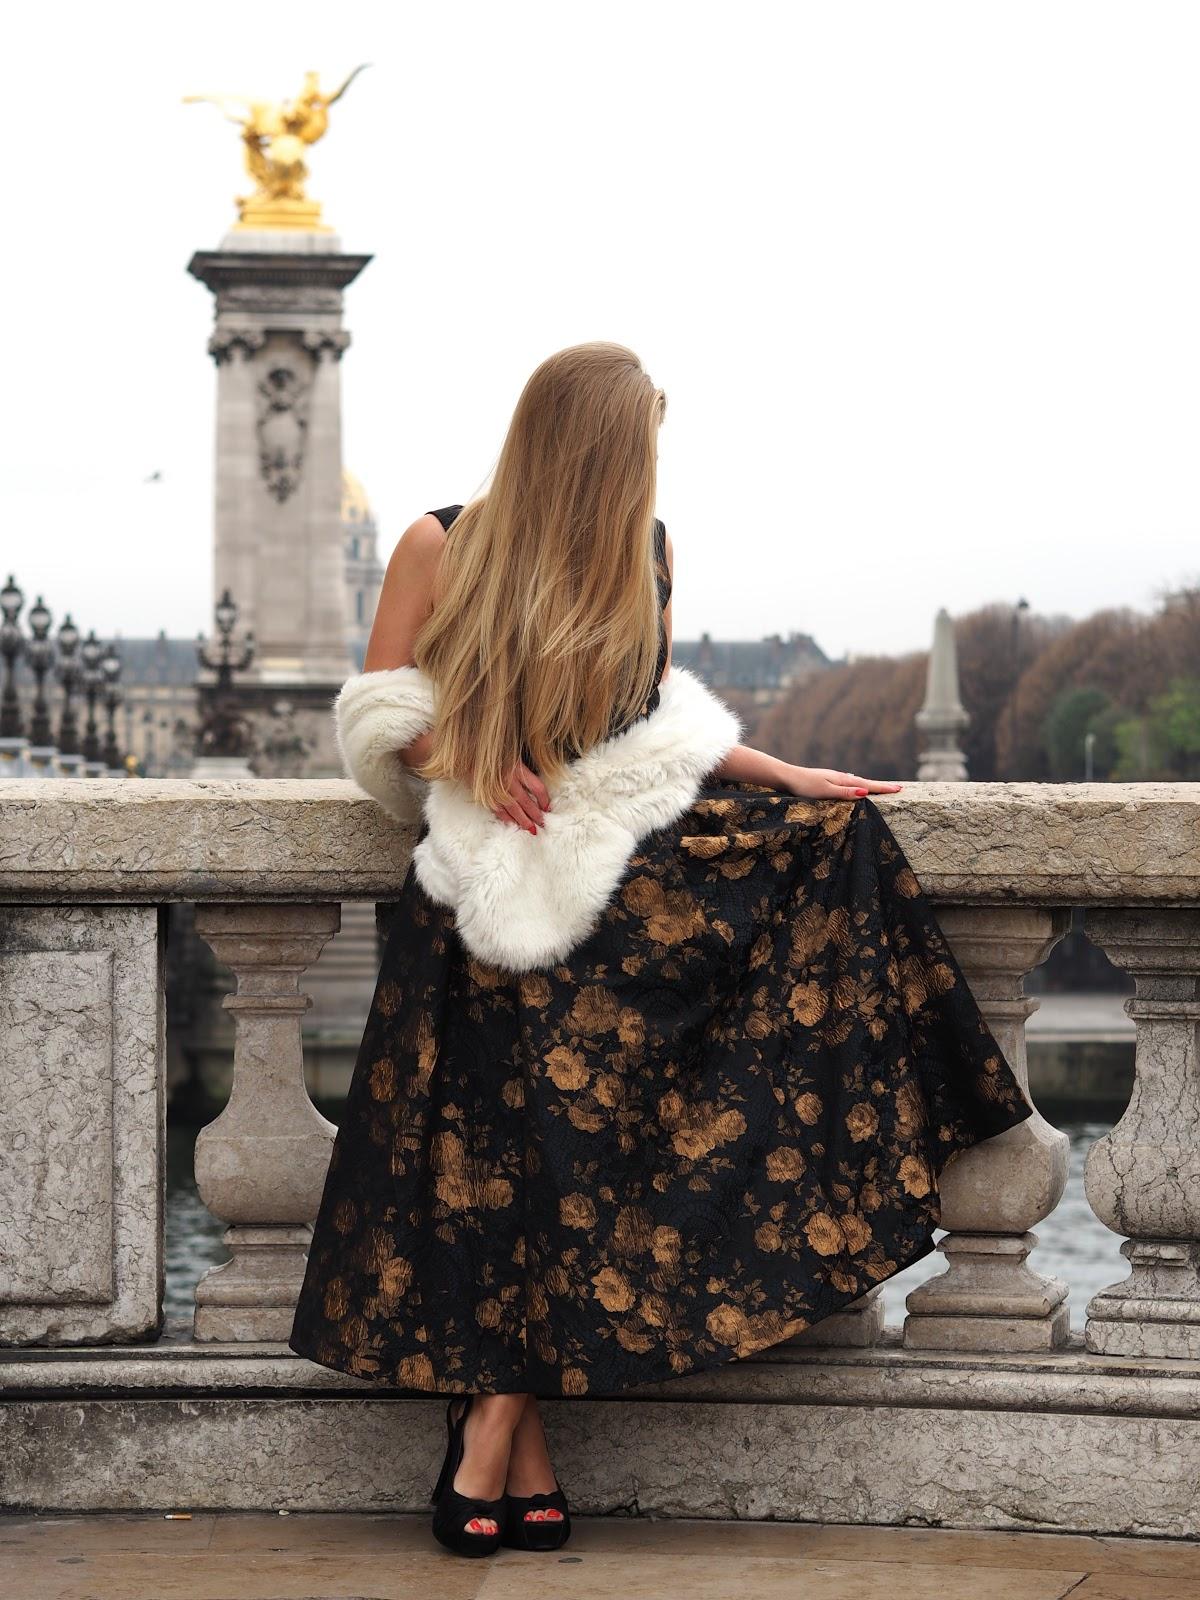 Blonde girl, Katie Matthews, KALANCHOE wearing Charlet Jacquard Dress by Ted Baker, 40's style